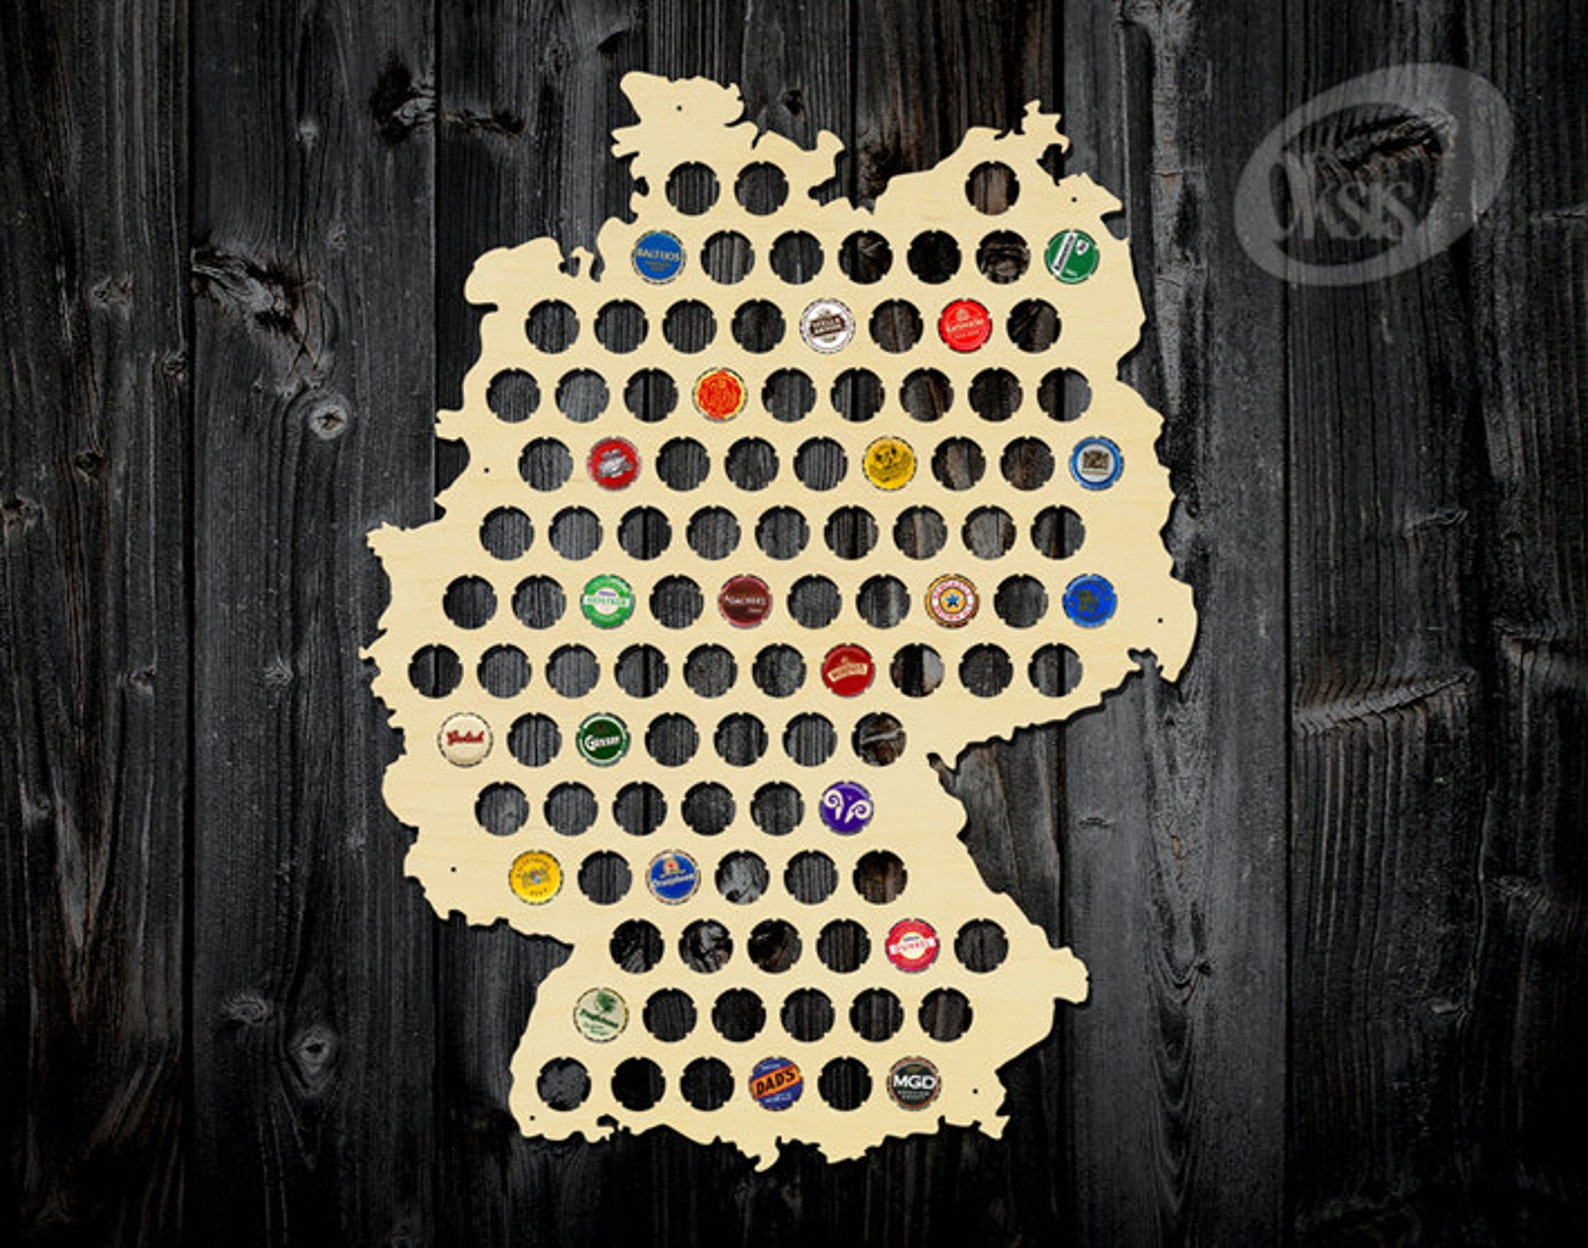 Beer Cap Map, Beer Cap Map of Germany